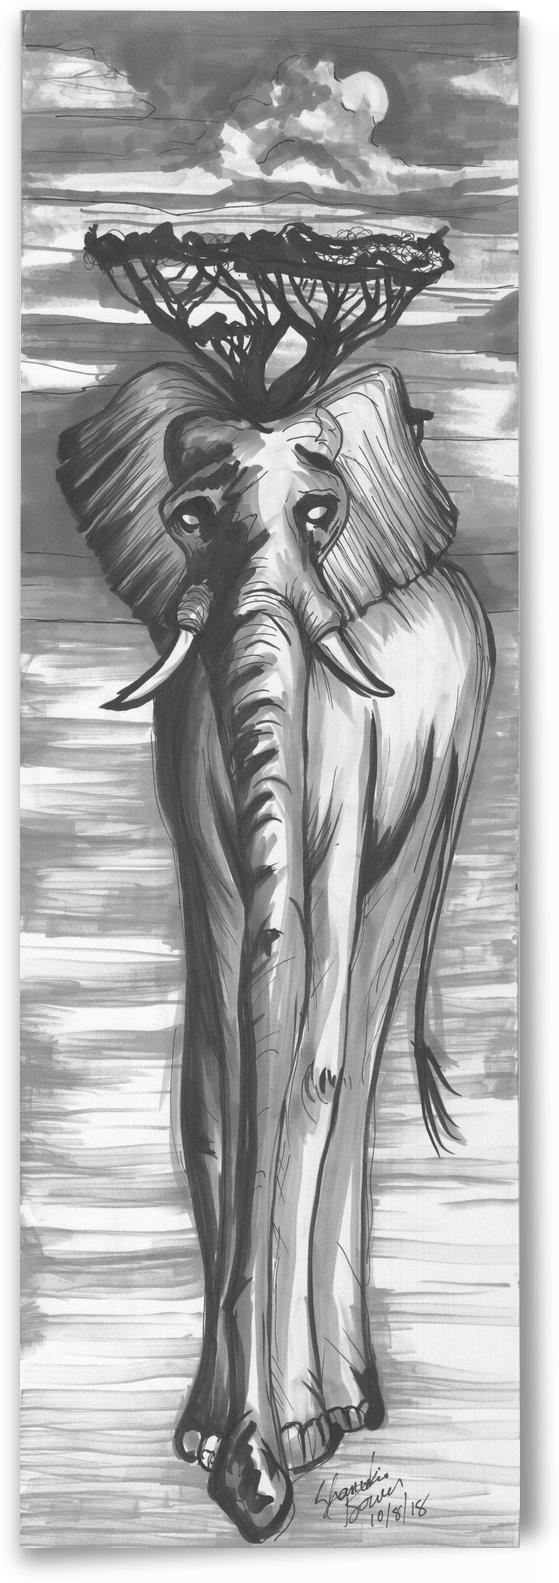 A long trunk by Shanrekia Bower